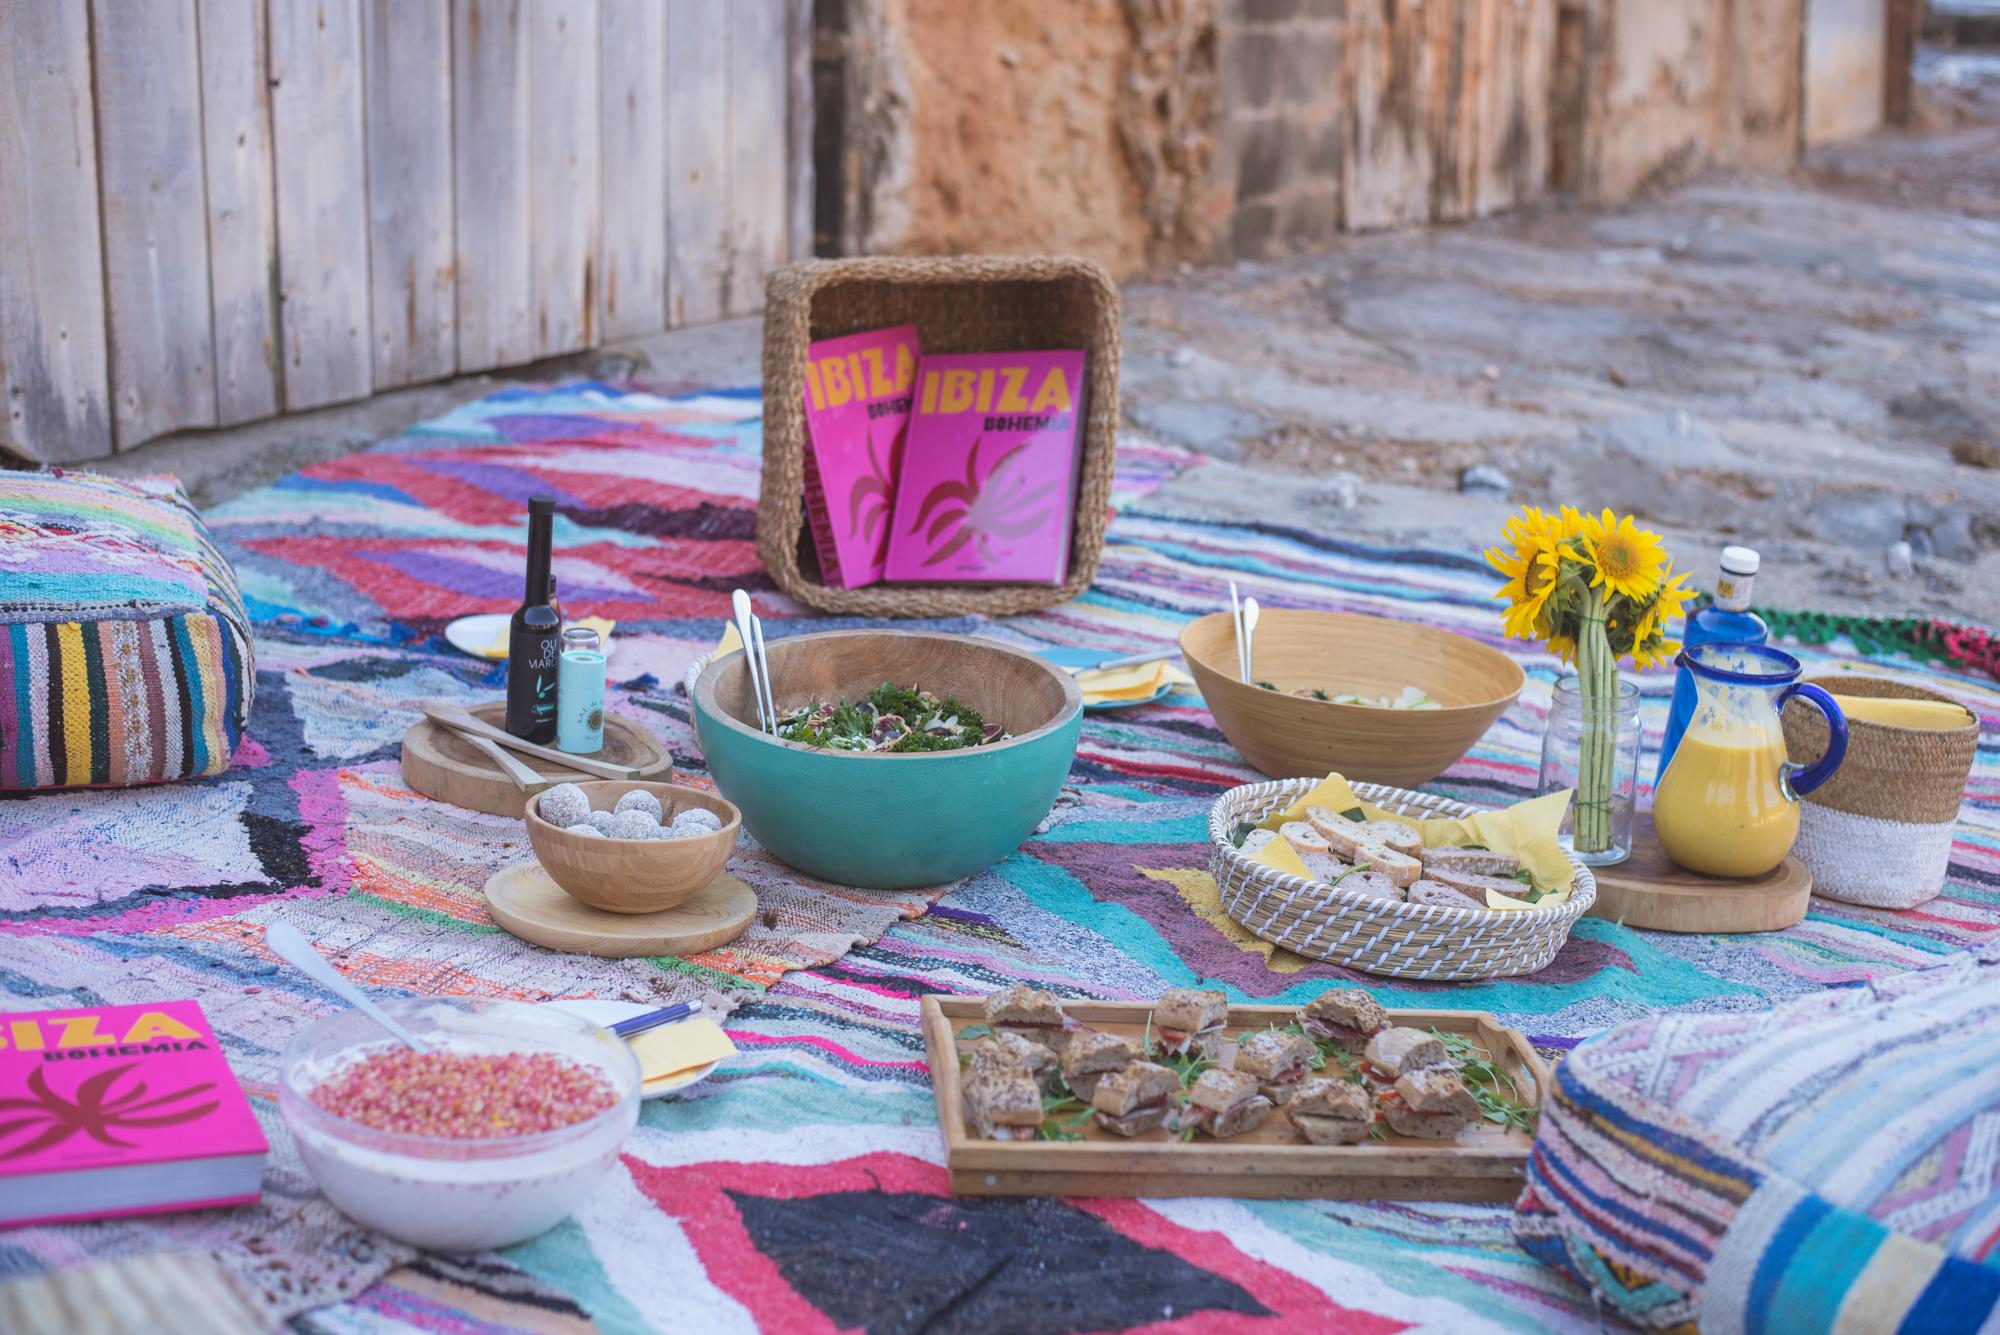 Bohemian picnic with editor of the book Ibiza Bohemia, Renu Kashyap